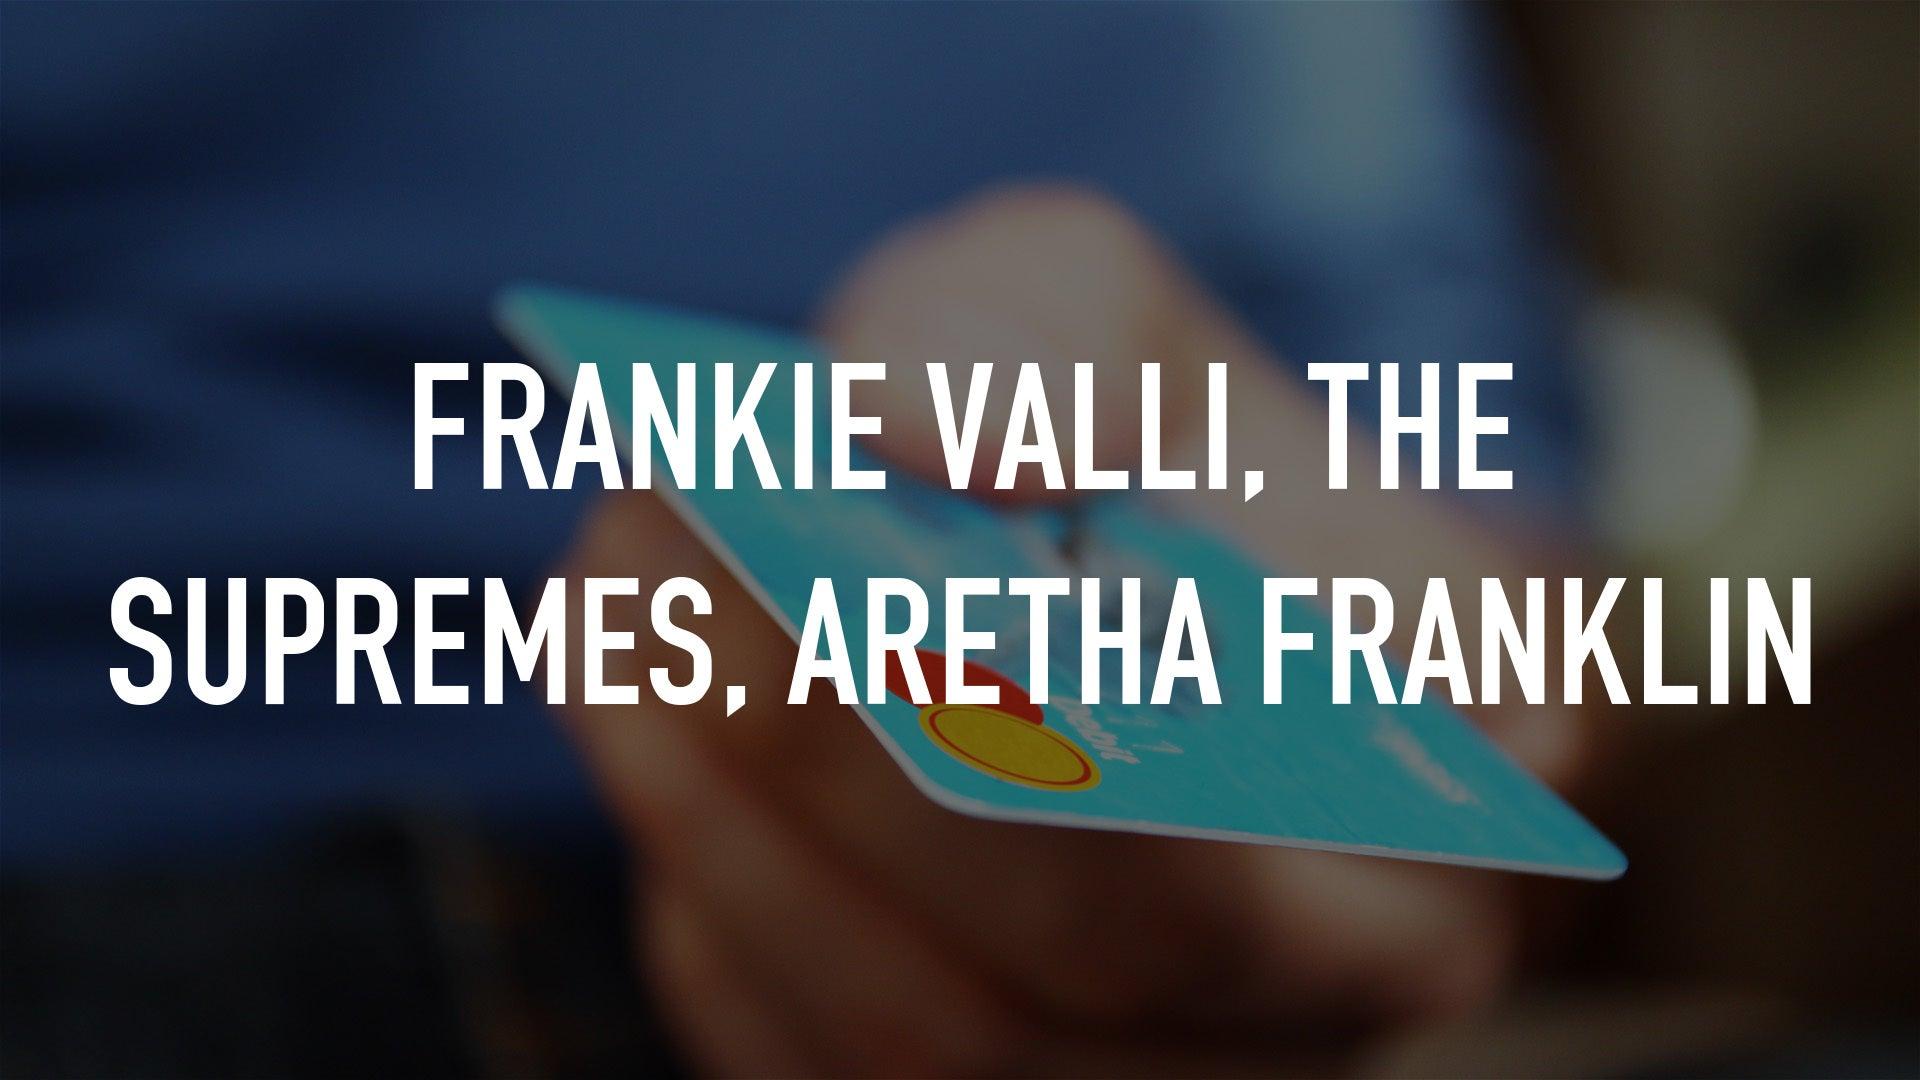 Frankie Valli, The Supremes, Aretha Franklin